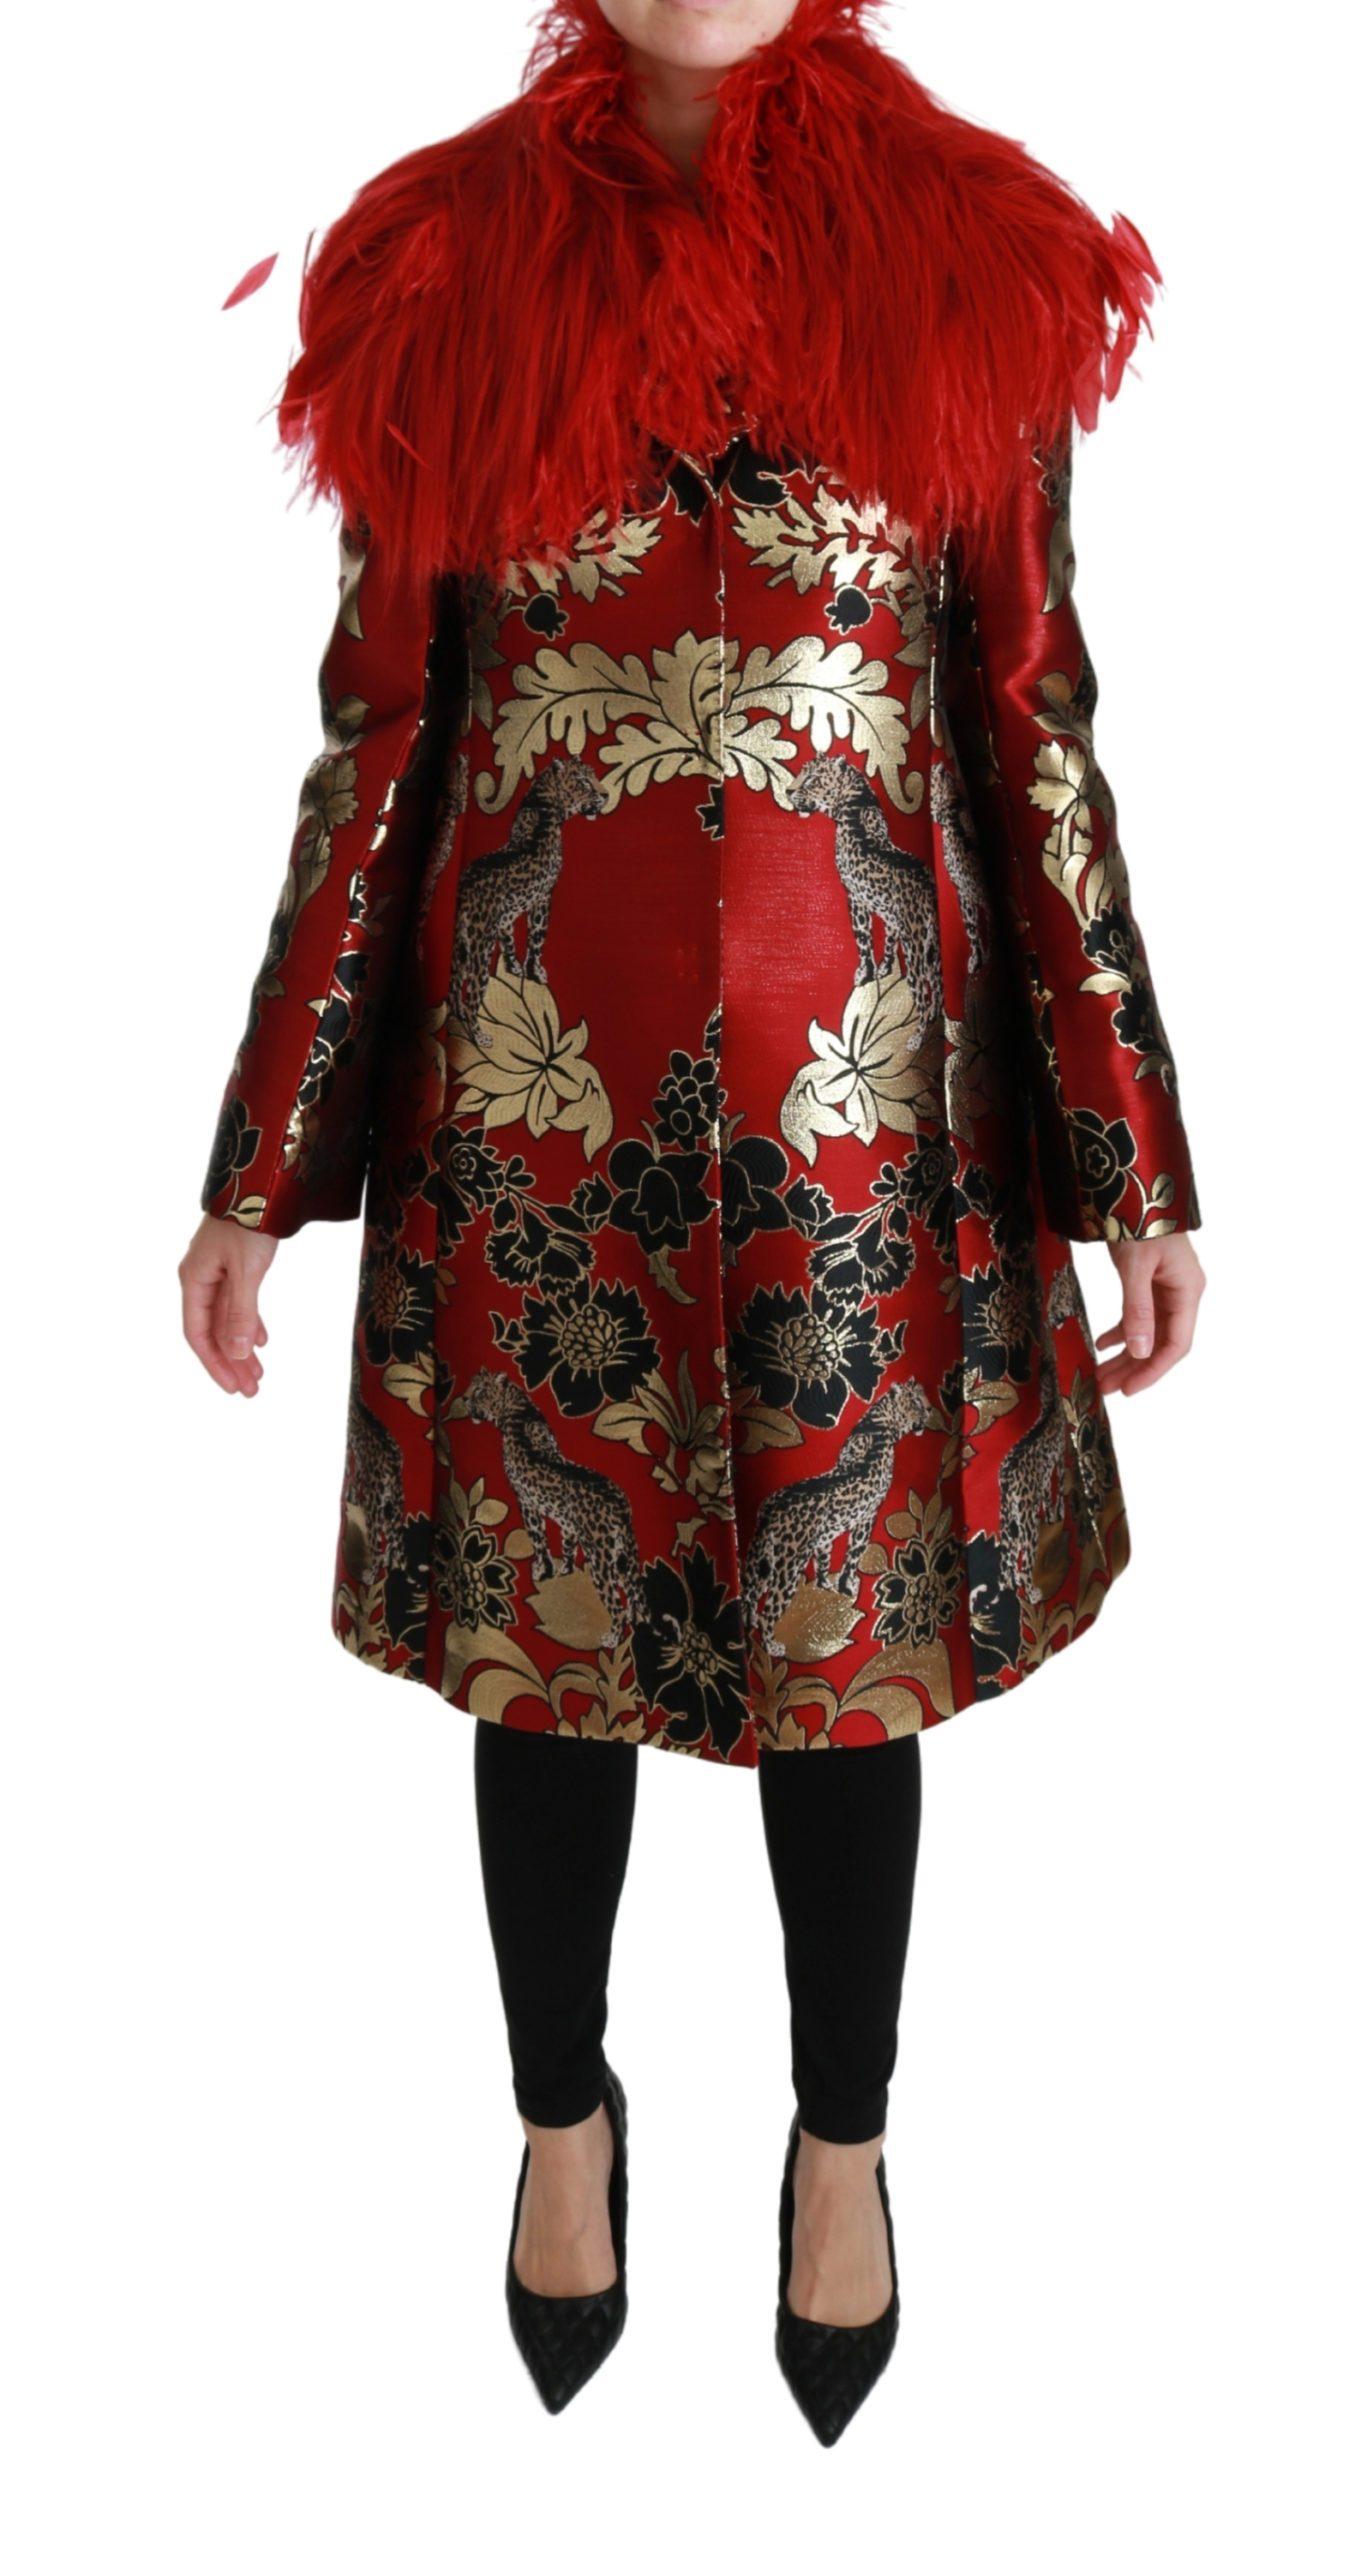 Dolce & Gabbana Women's Fur Floral Leopard Trenchcoat Jacket Red JKT2571 - IT40|S